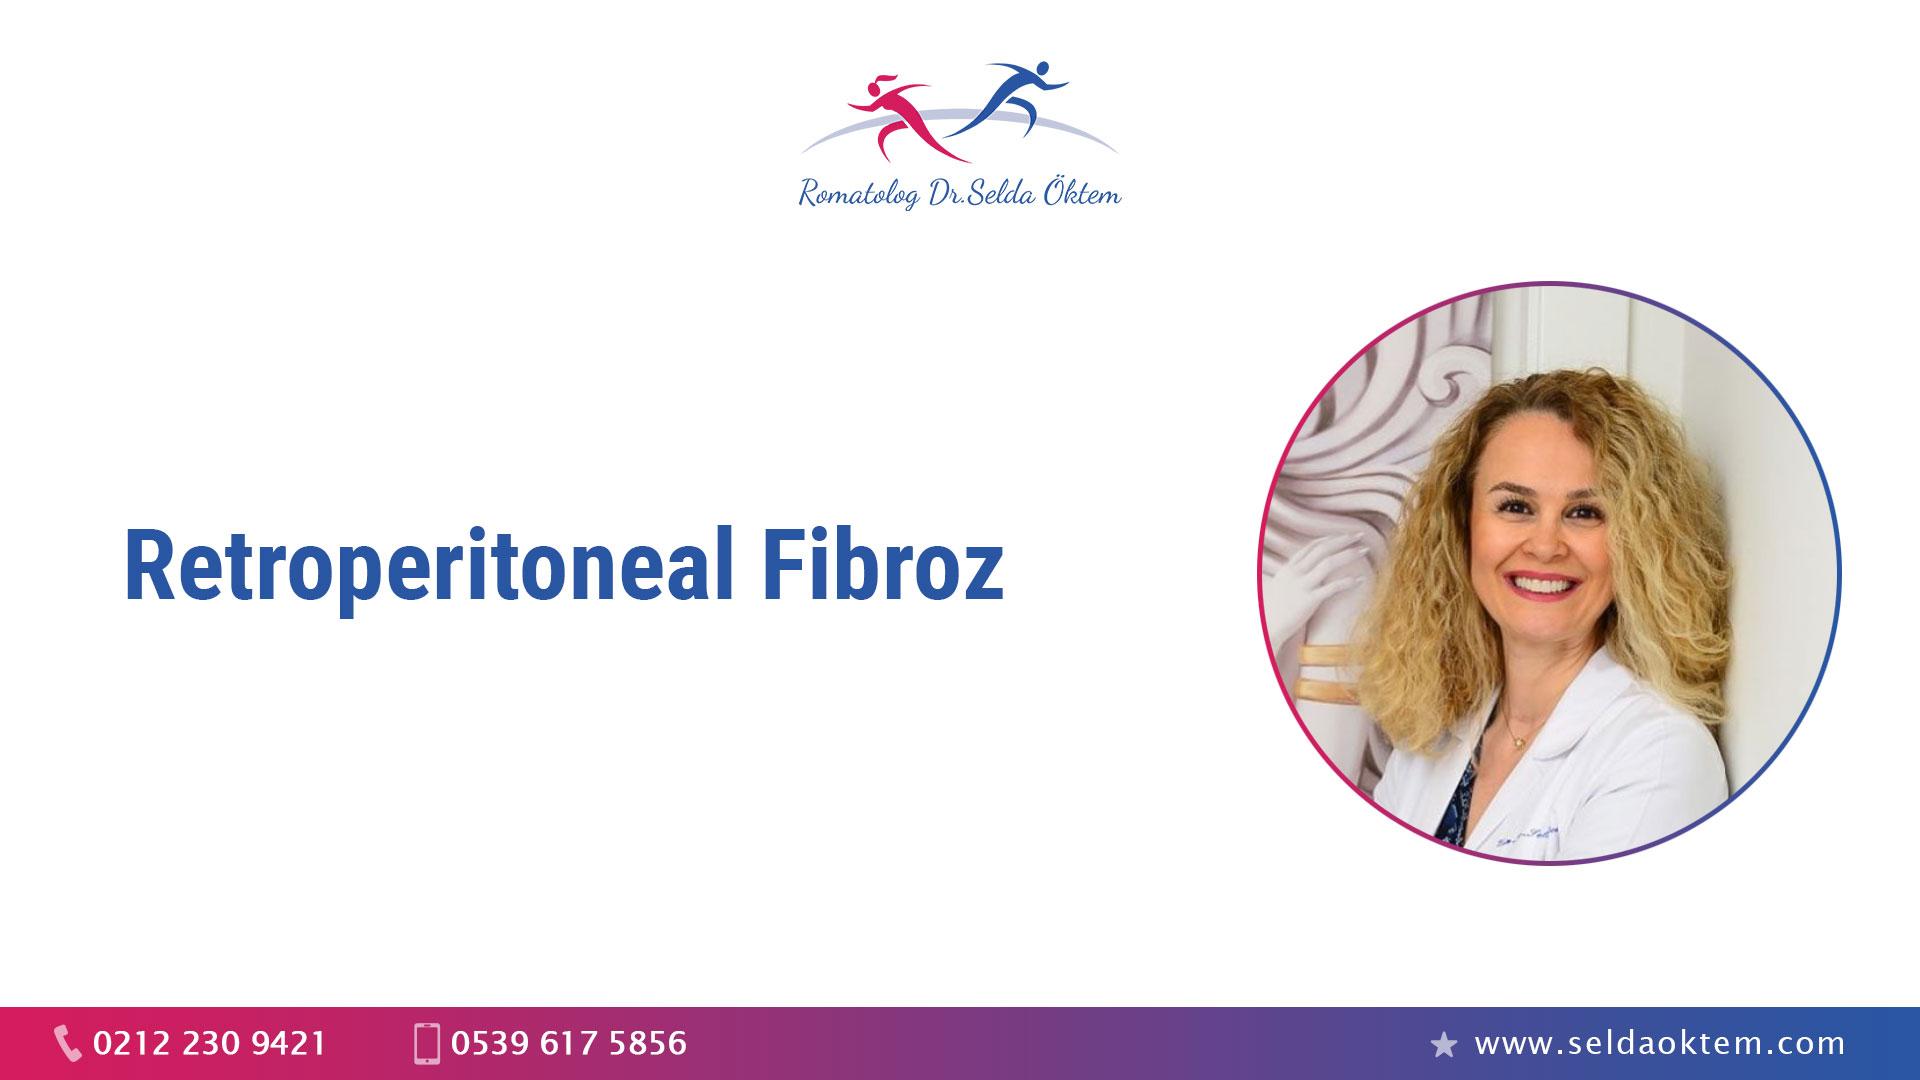 Retroperitoneal Fibroz